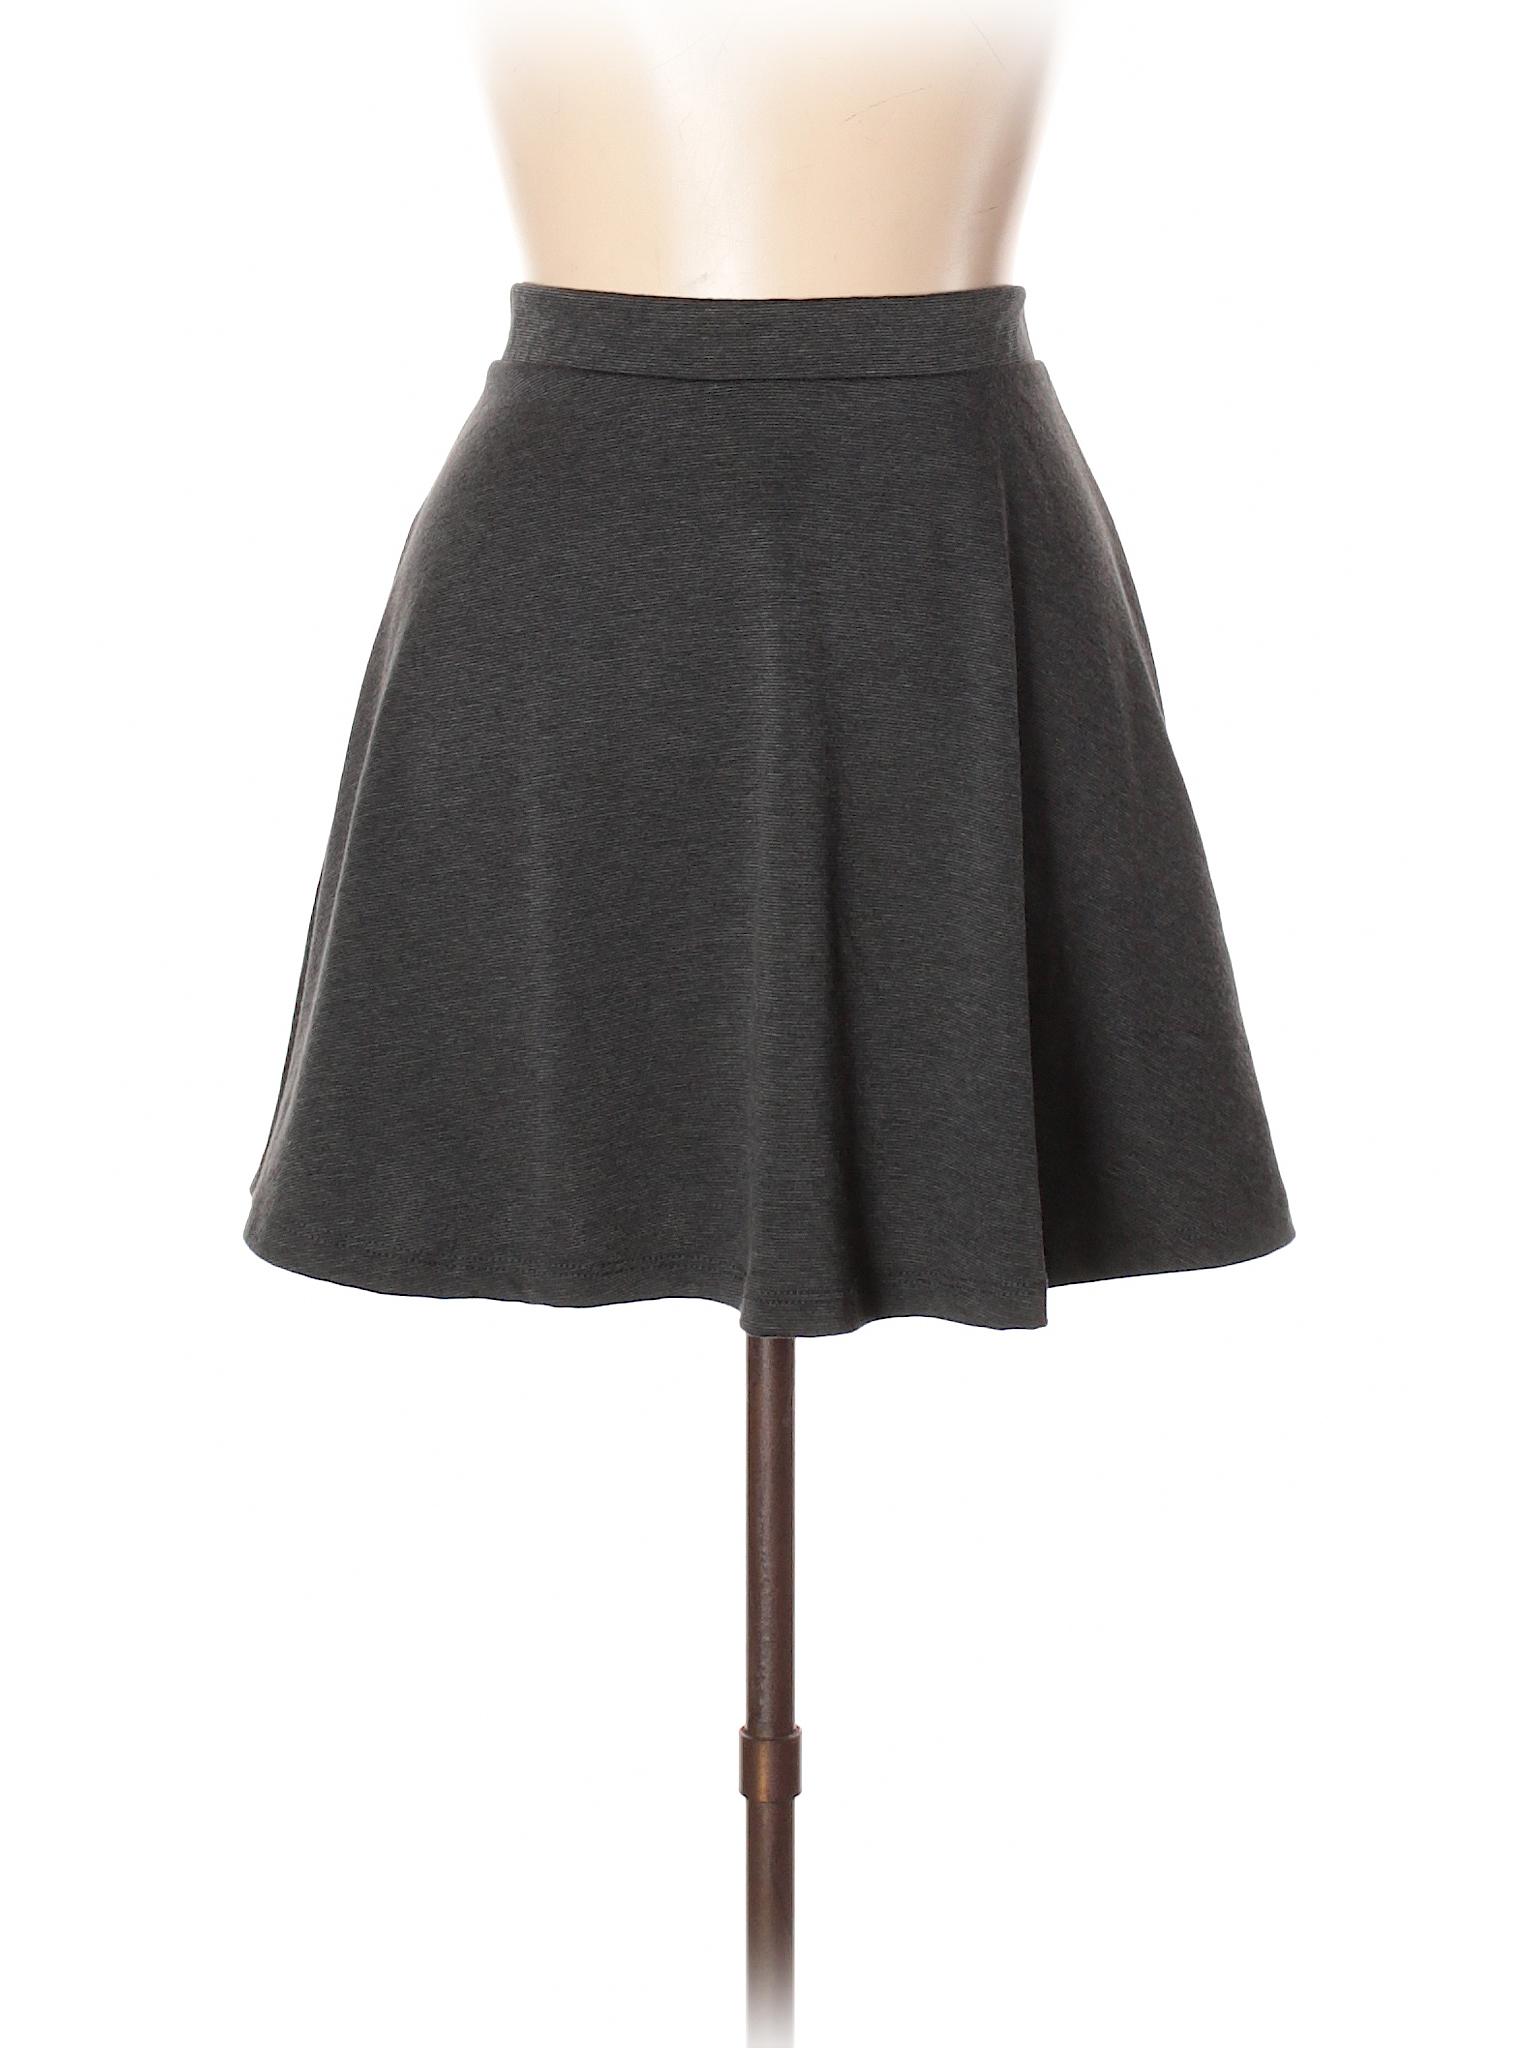 Skirt Trendyland Trendyland Boutique Trendyland Casual Skirt Casual Boutique Casual Boutique tzaA6wHxqw